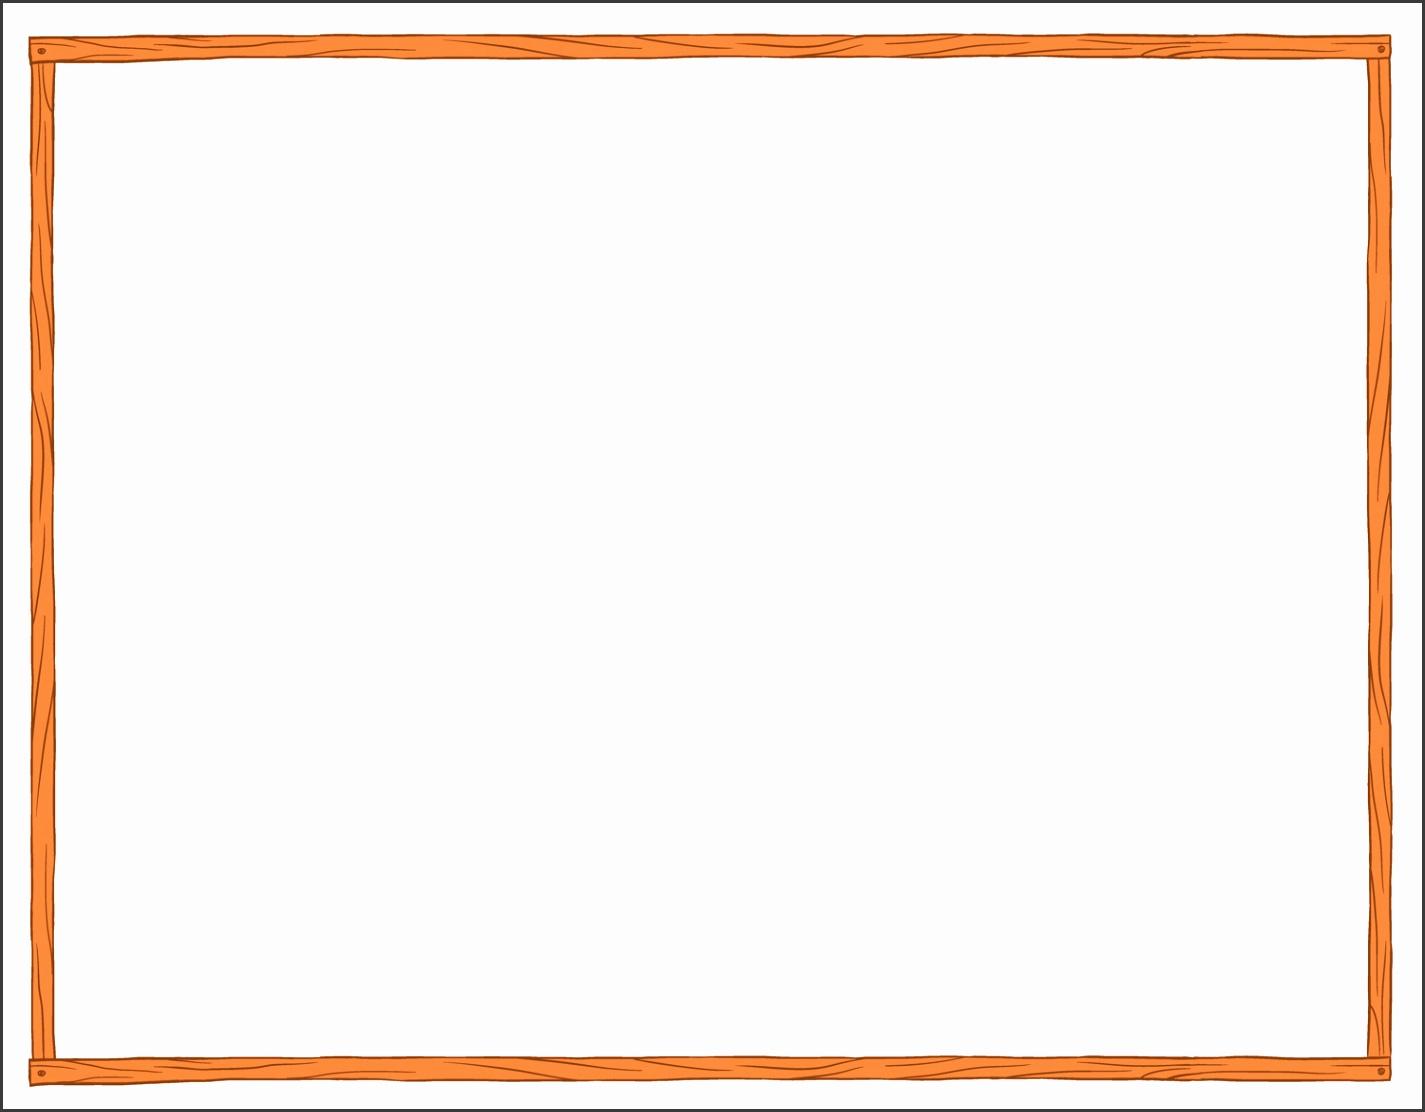 blank flyer templatesBlank Christmas Flyer Template Search Results Calendar 2015 uT9hdLCu